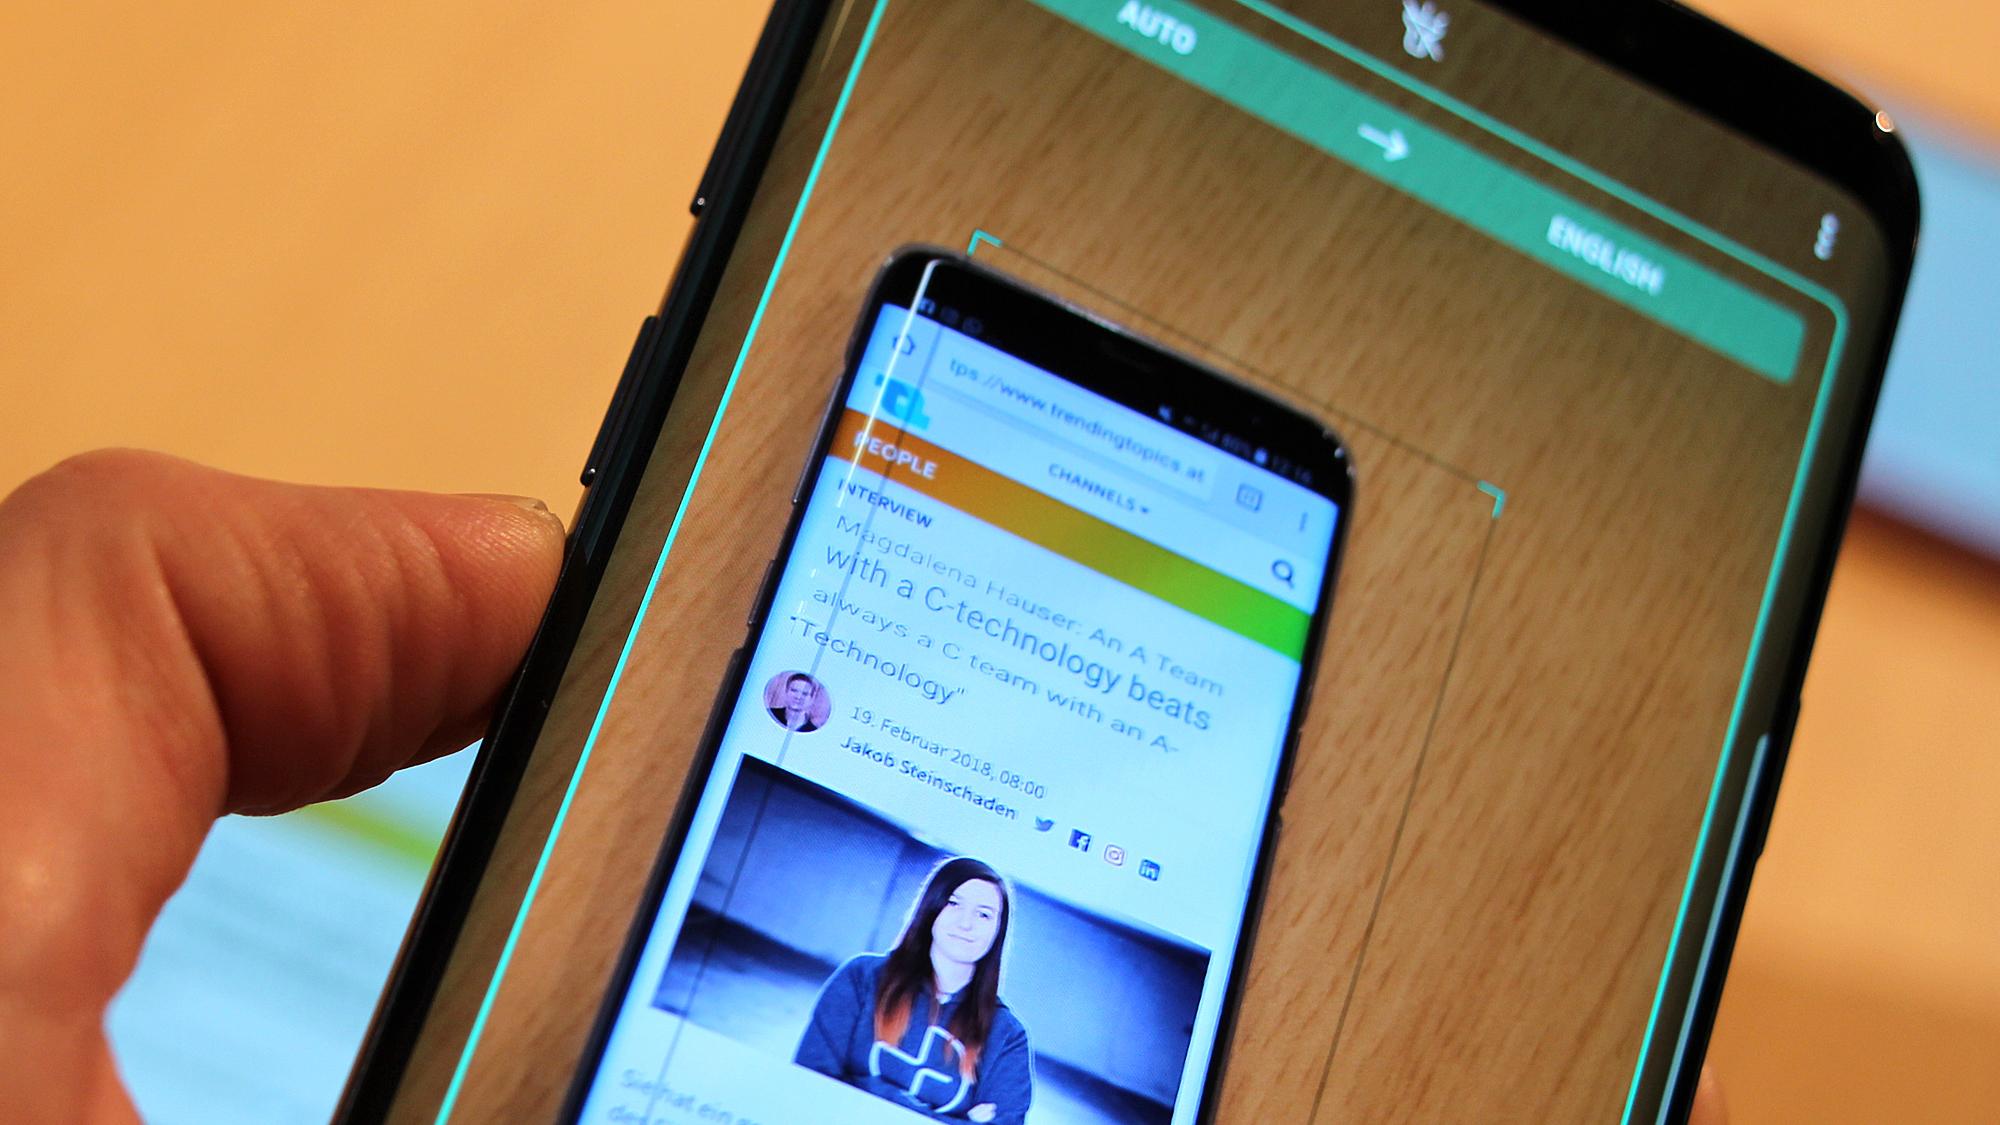 Bixby übersetzt Texte am Samsung Galaxy S9 in Echtzeit. © Trending Topics